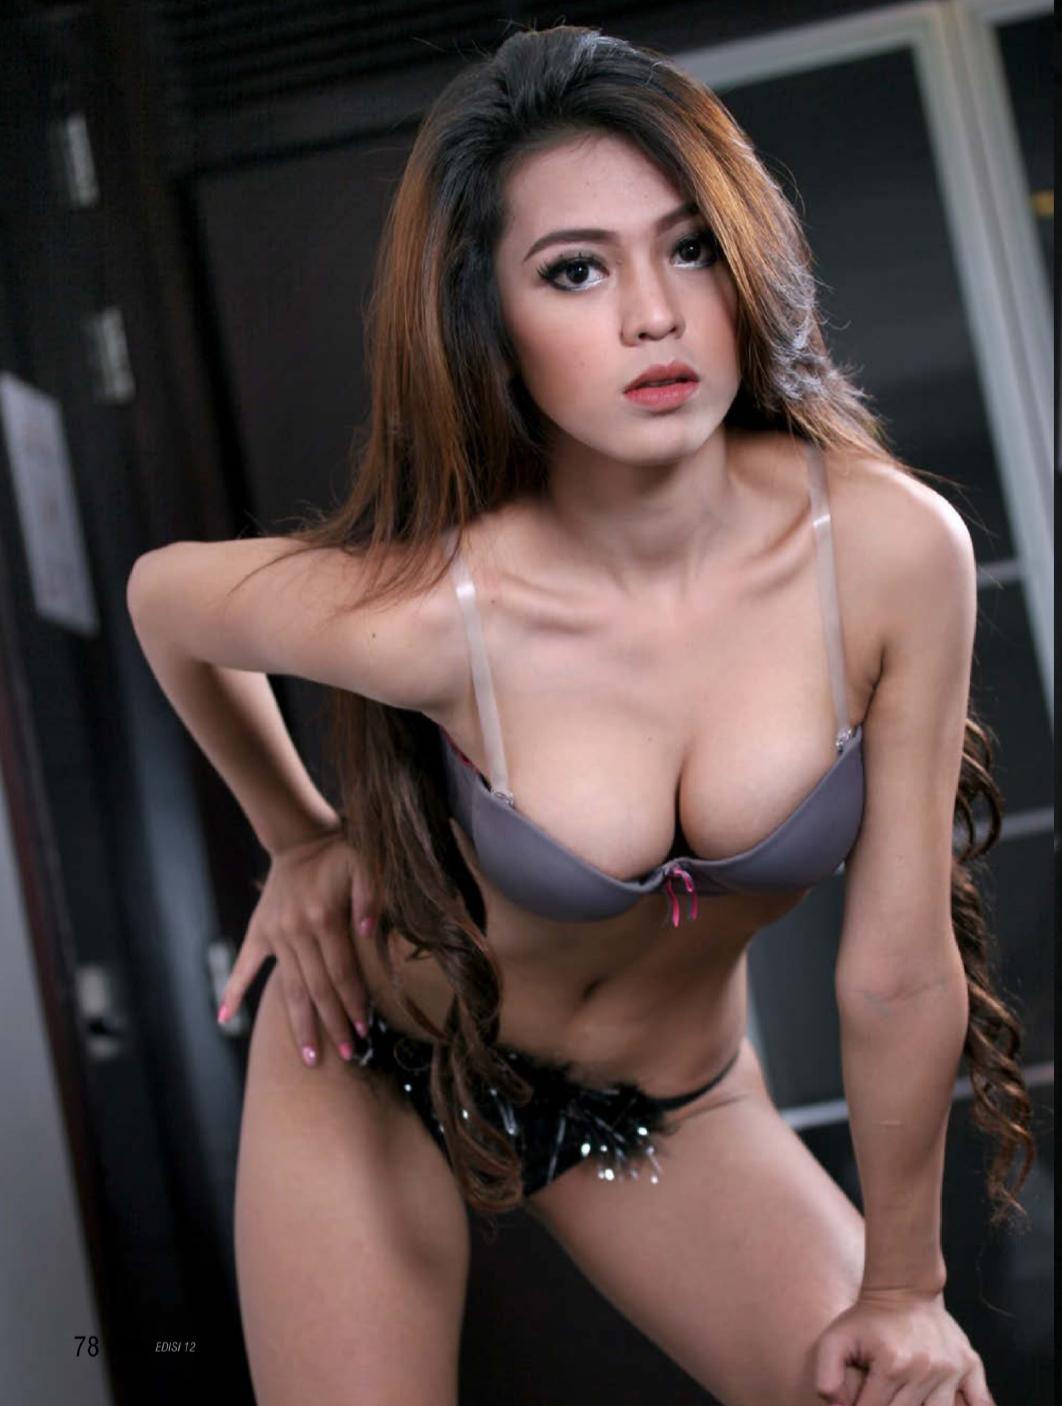 Sexy Pose Verra Indah On GRess Magazine